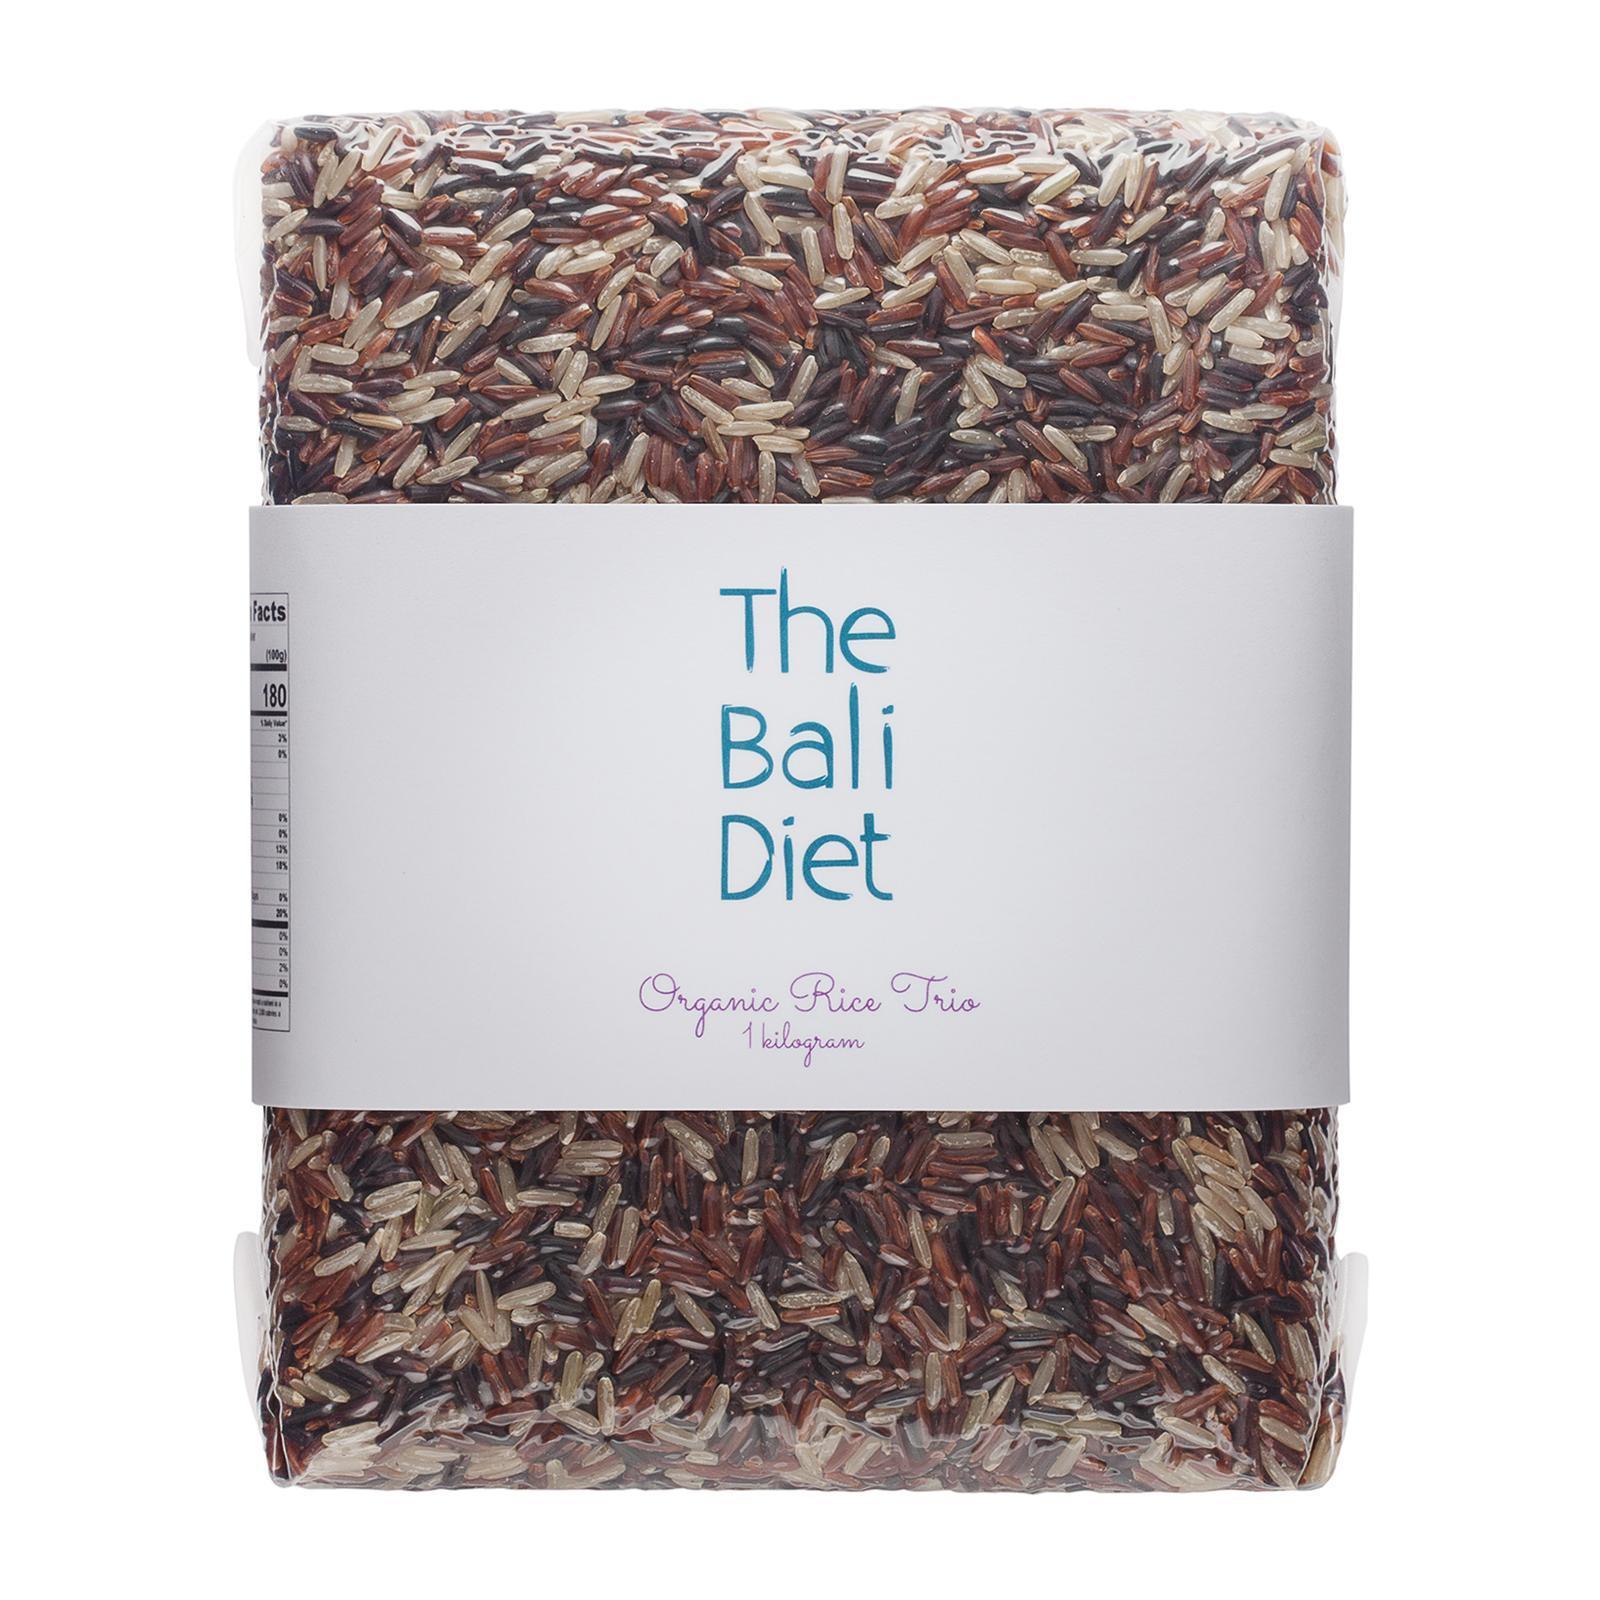 The Bali Diet Organic Rice Trio By Redmart.